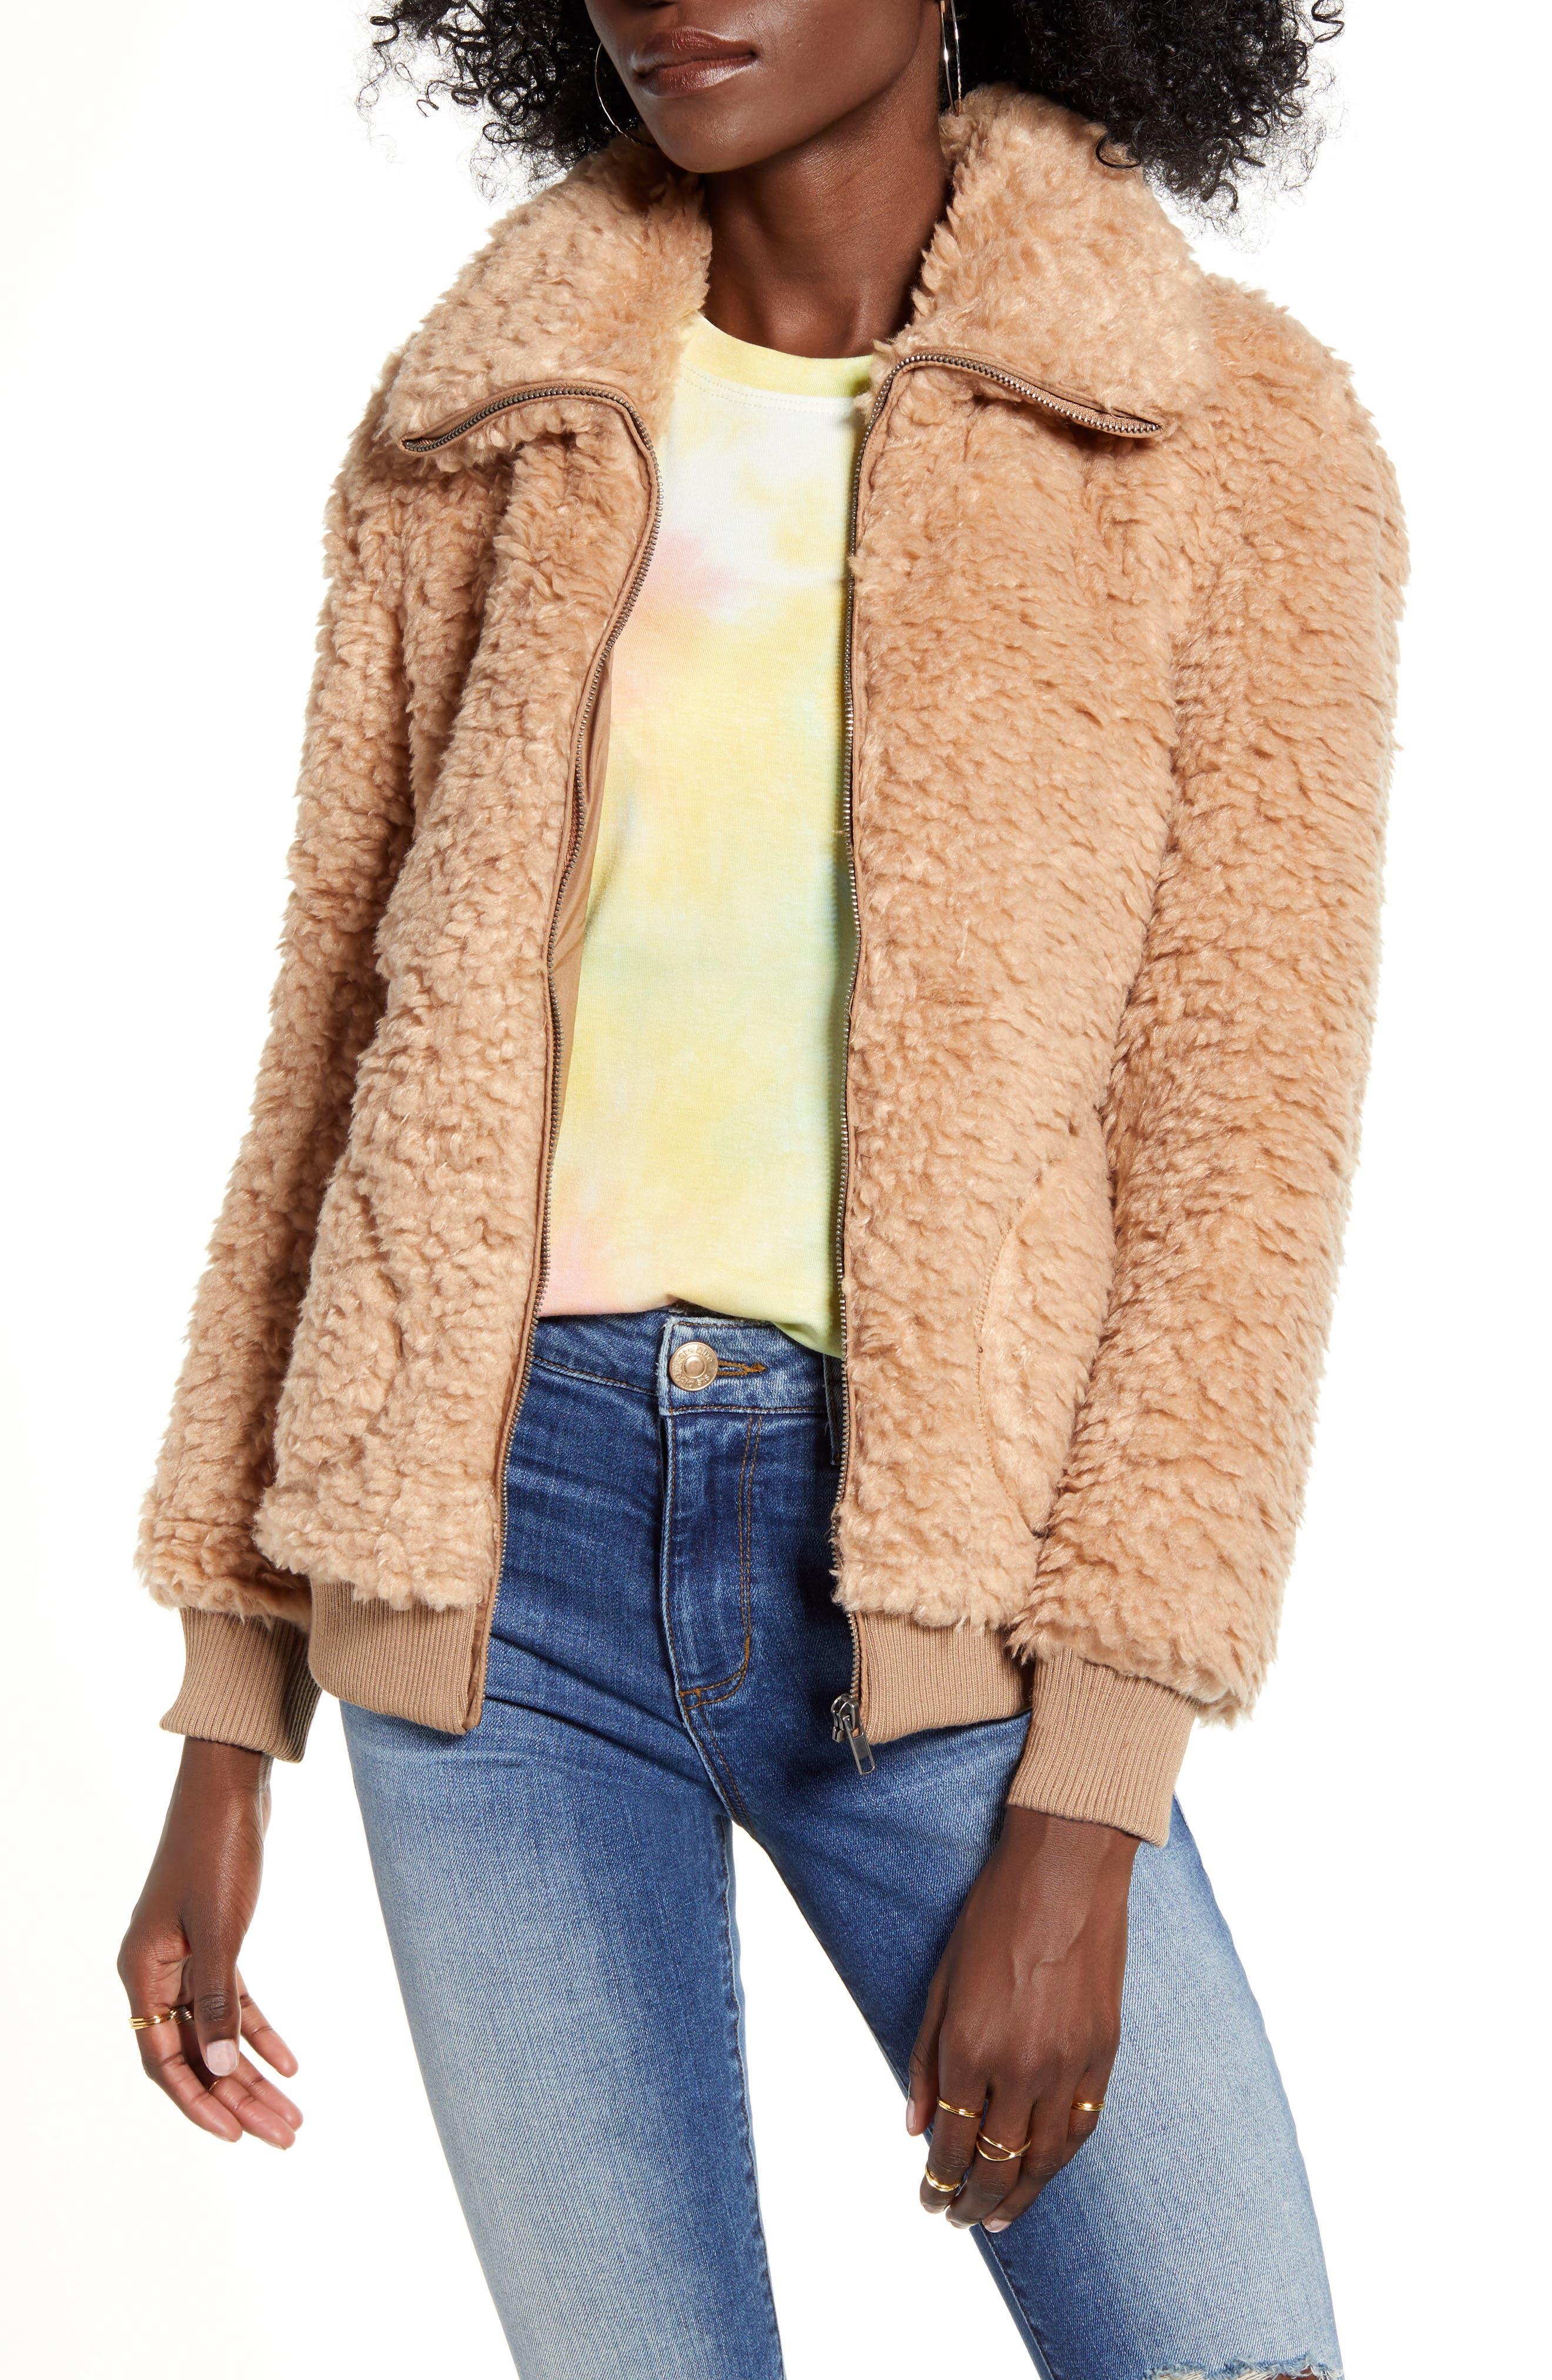 BB Dakota Teddy Or Not Faux Fur Bomber Jacket